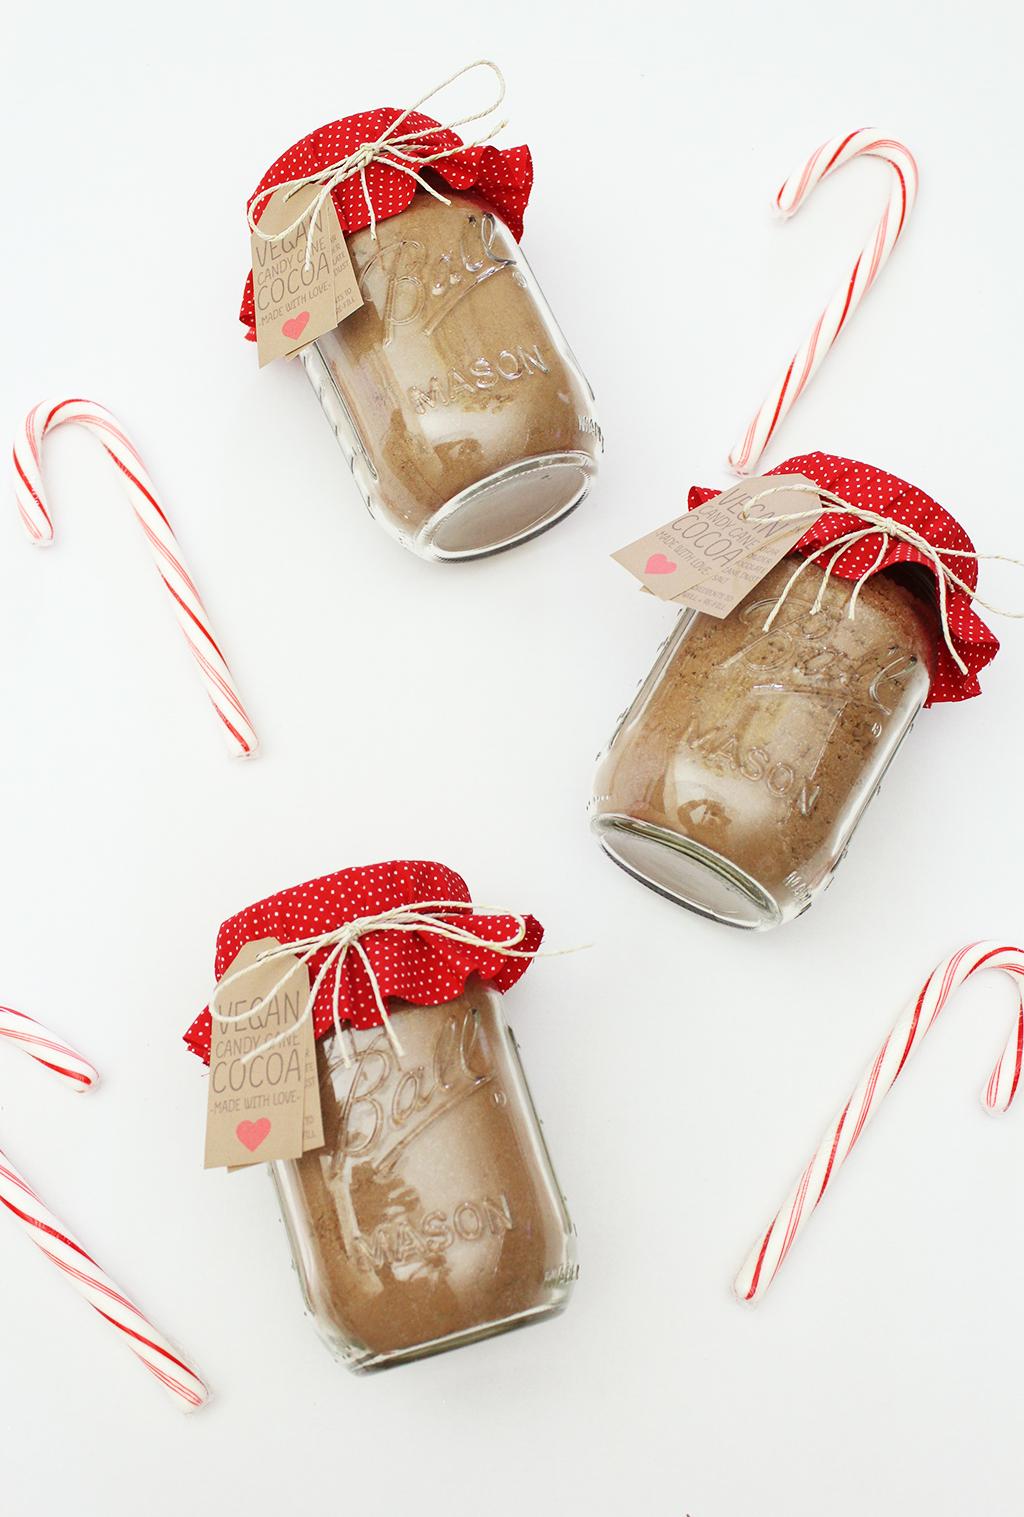 Vegan Candy Cane Cocoa Mix Jars